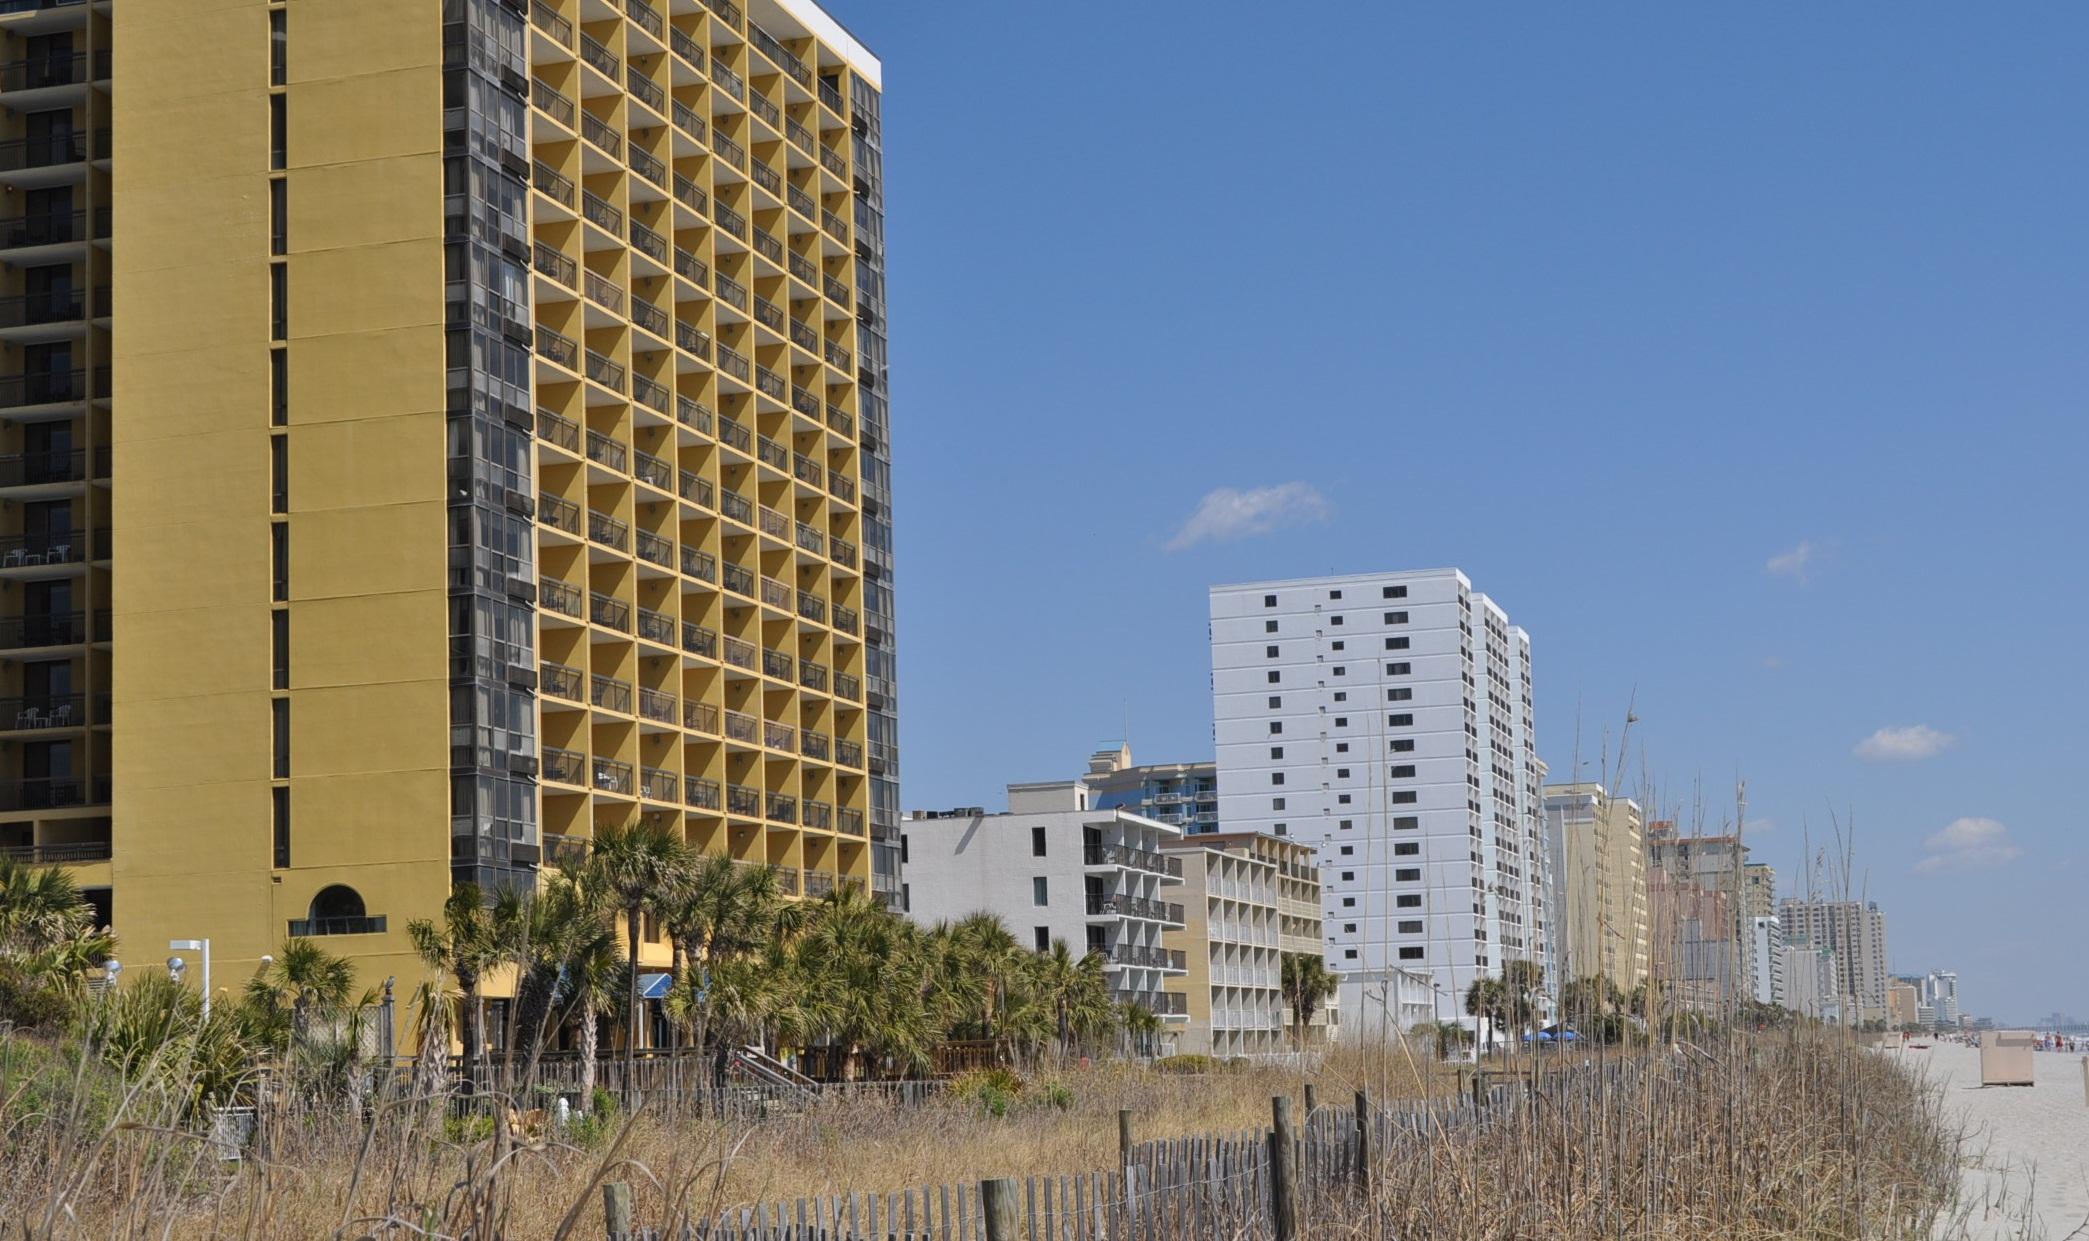 Myrtle Beach Condo Investment